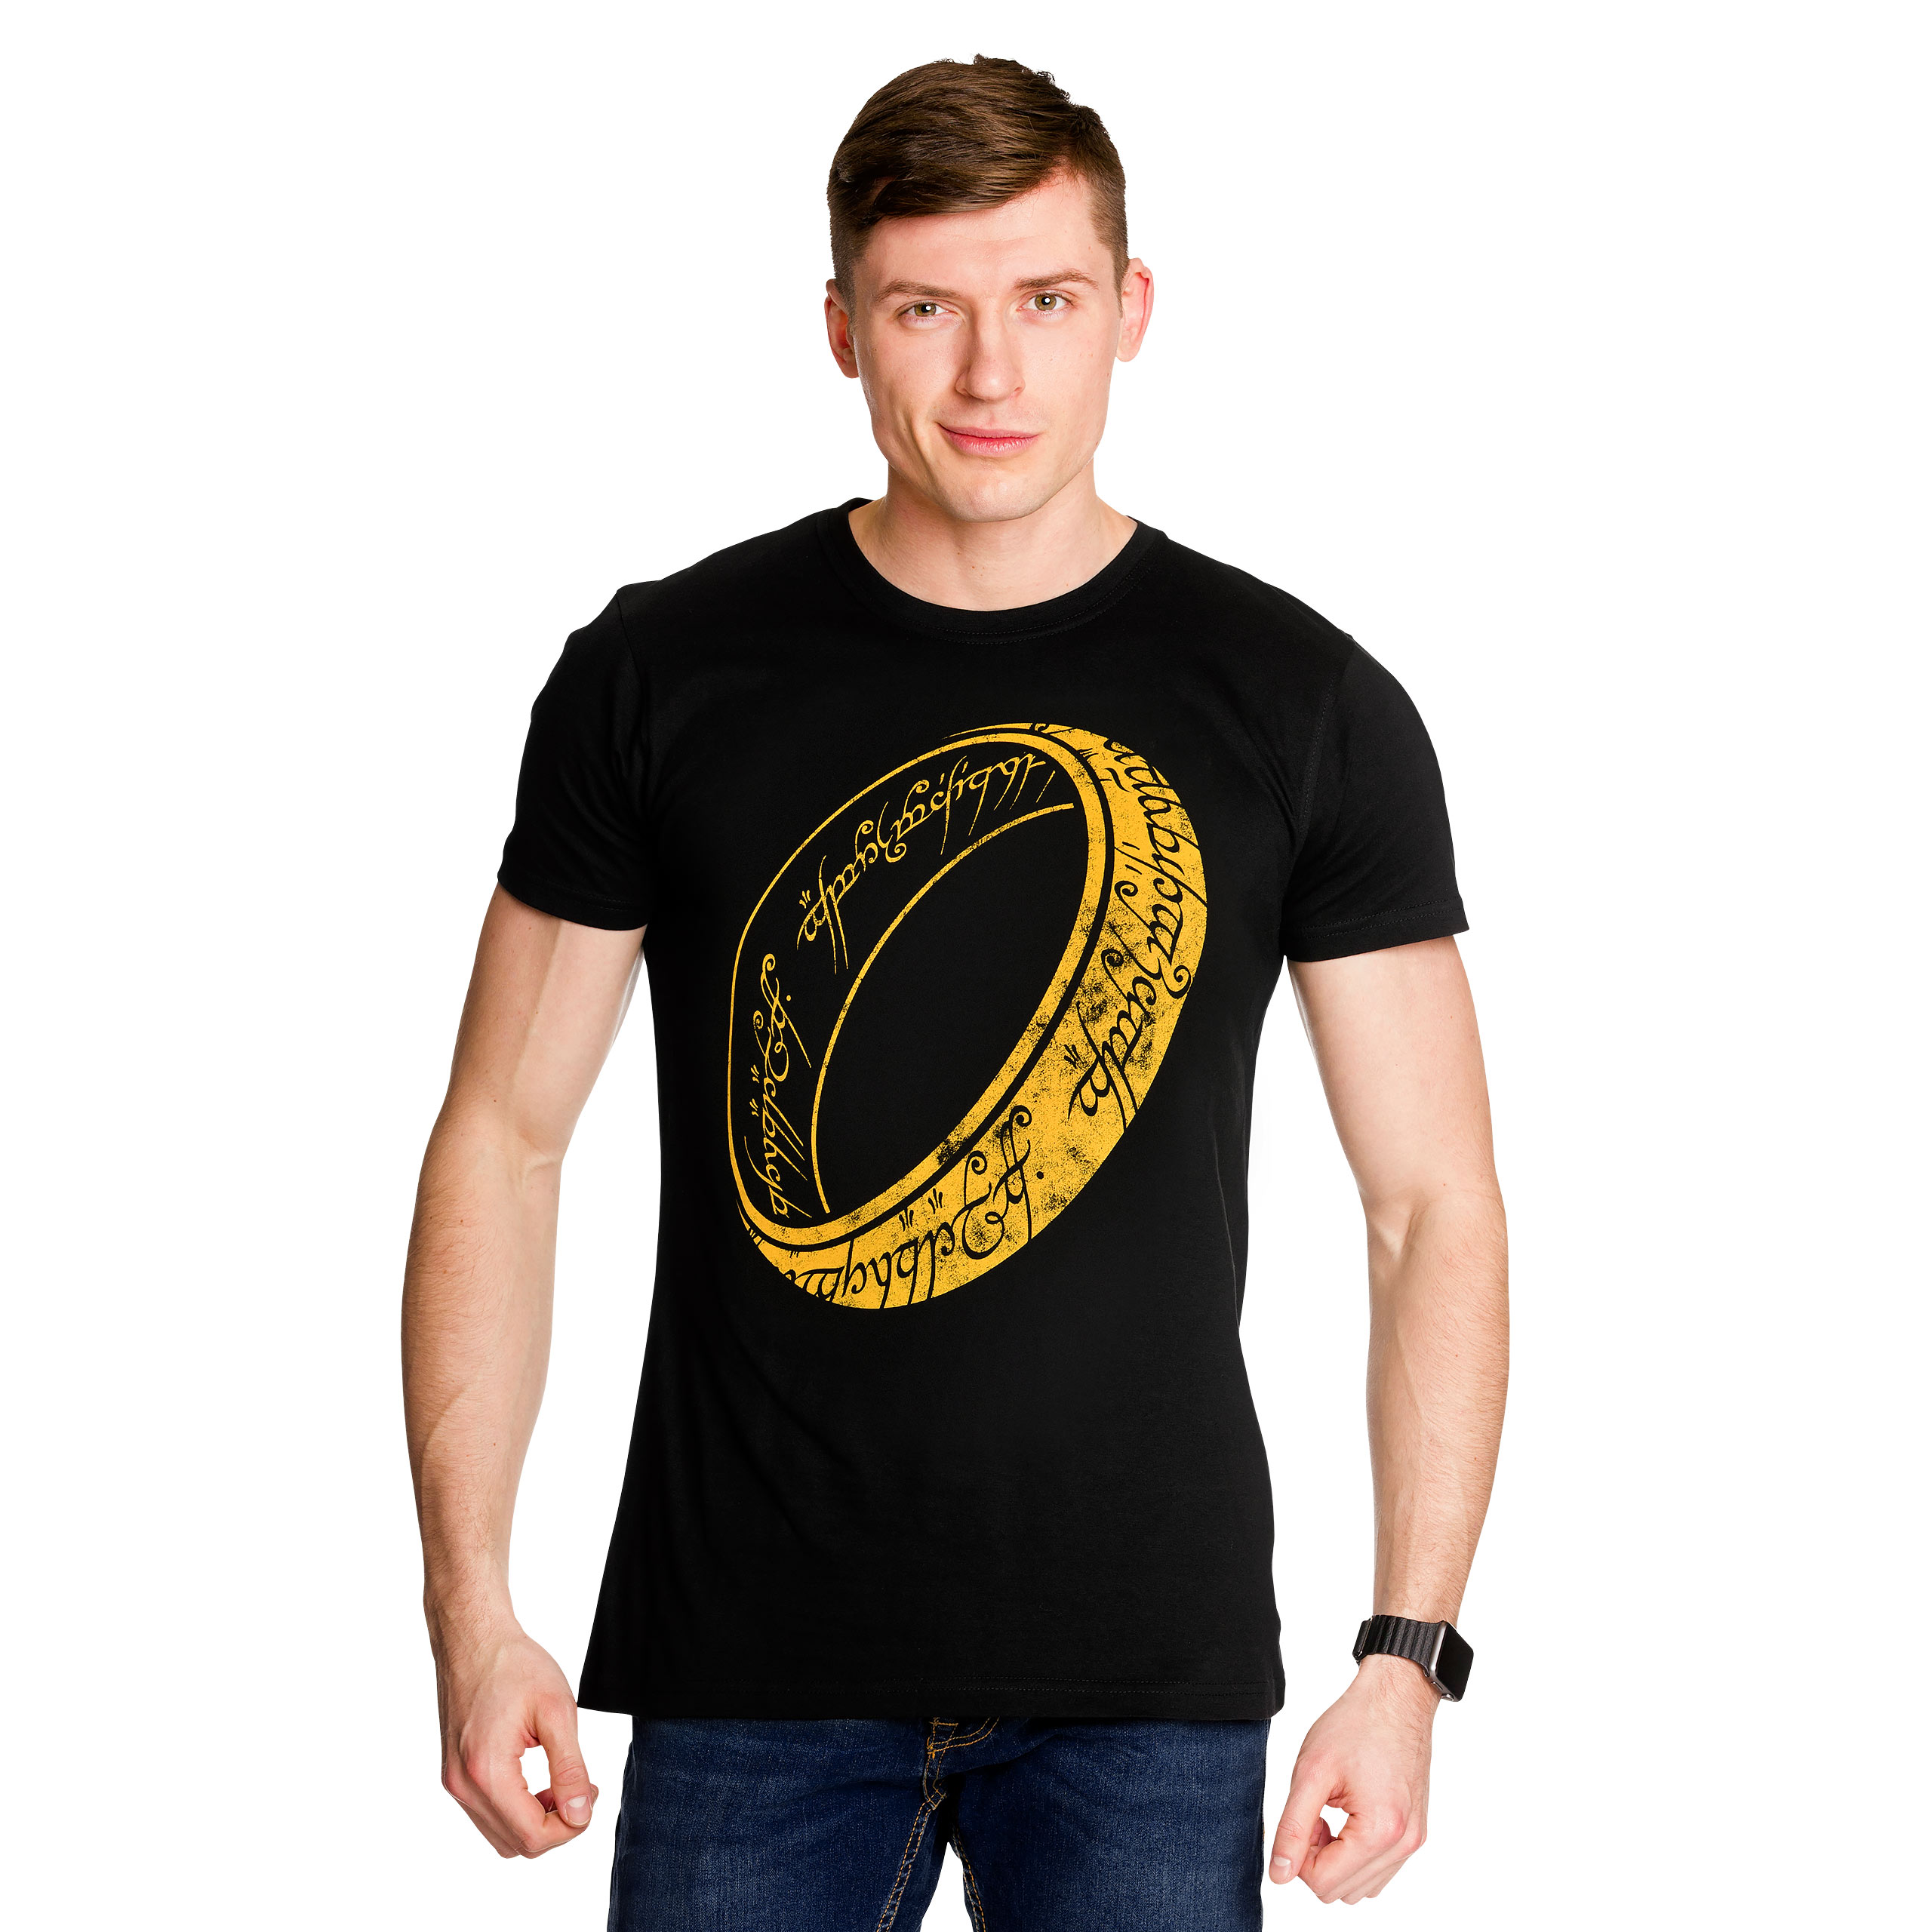 Herr der Ringe - One Ring to Rule T-Shirt schwarz